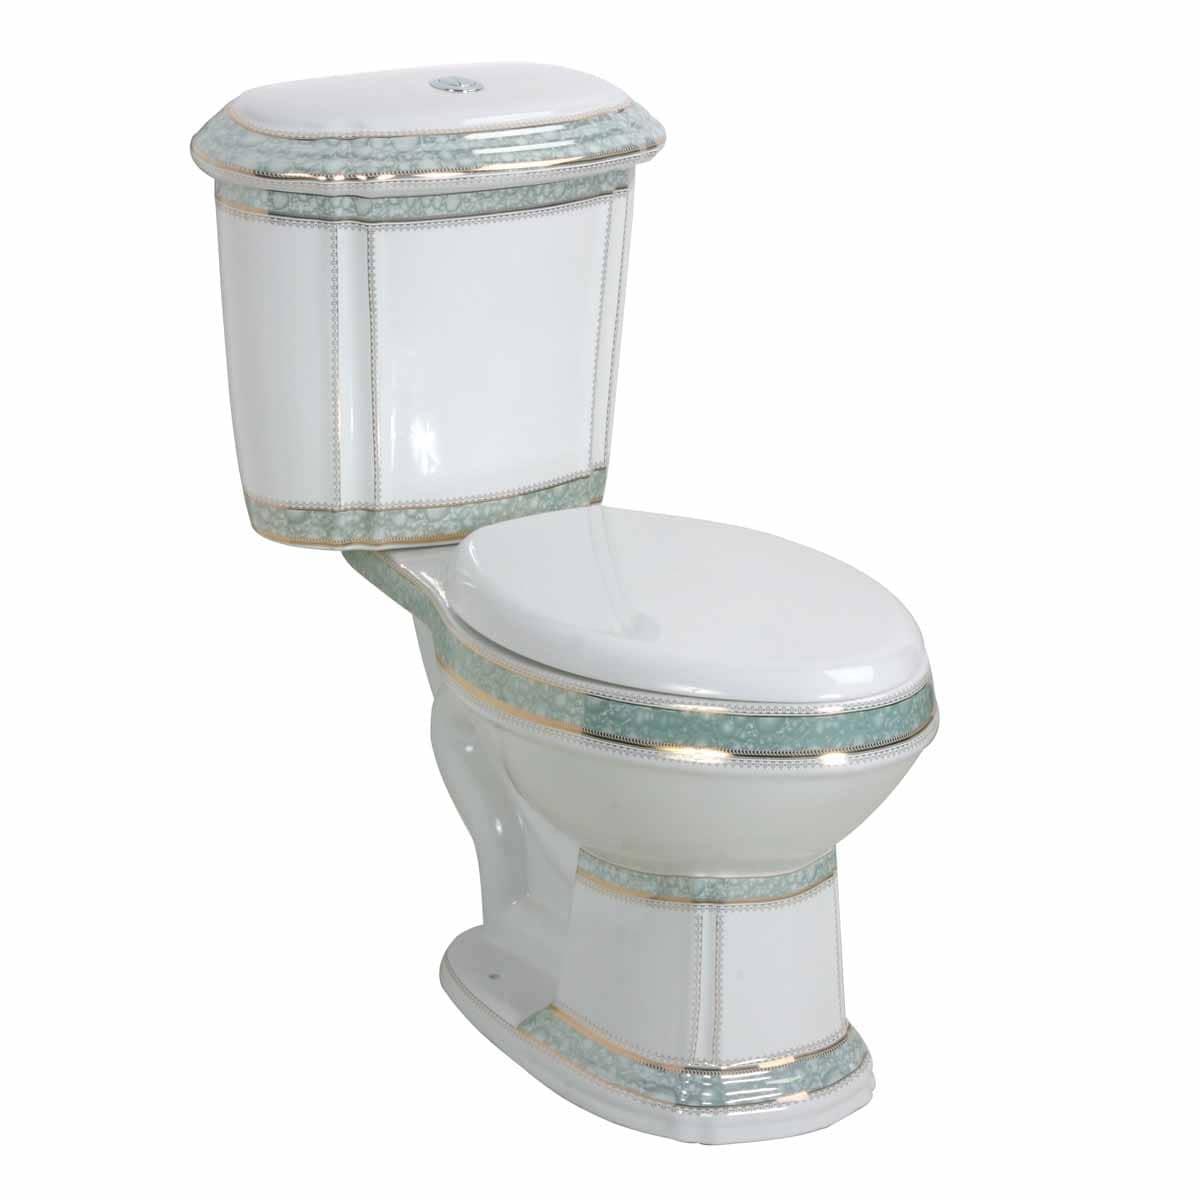 Buy Bathroom Toilets Online at Overstock.com | Our Best Toilets Deals